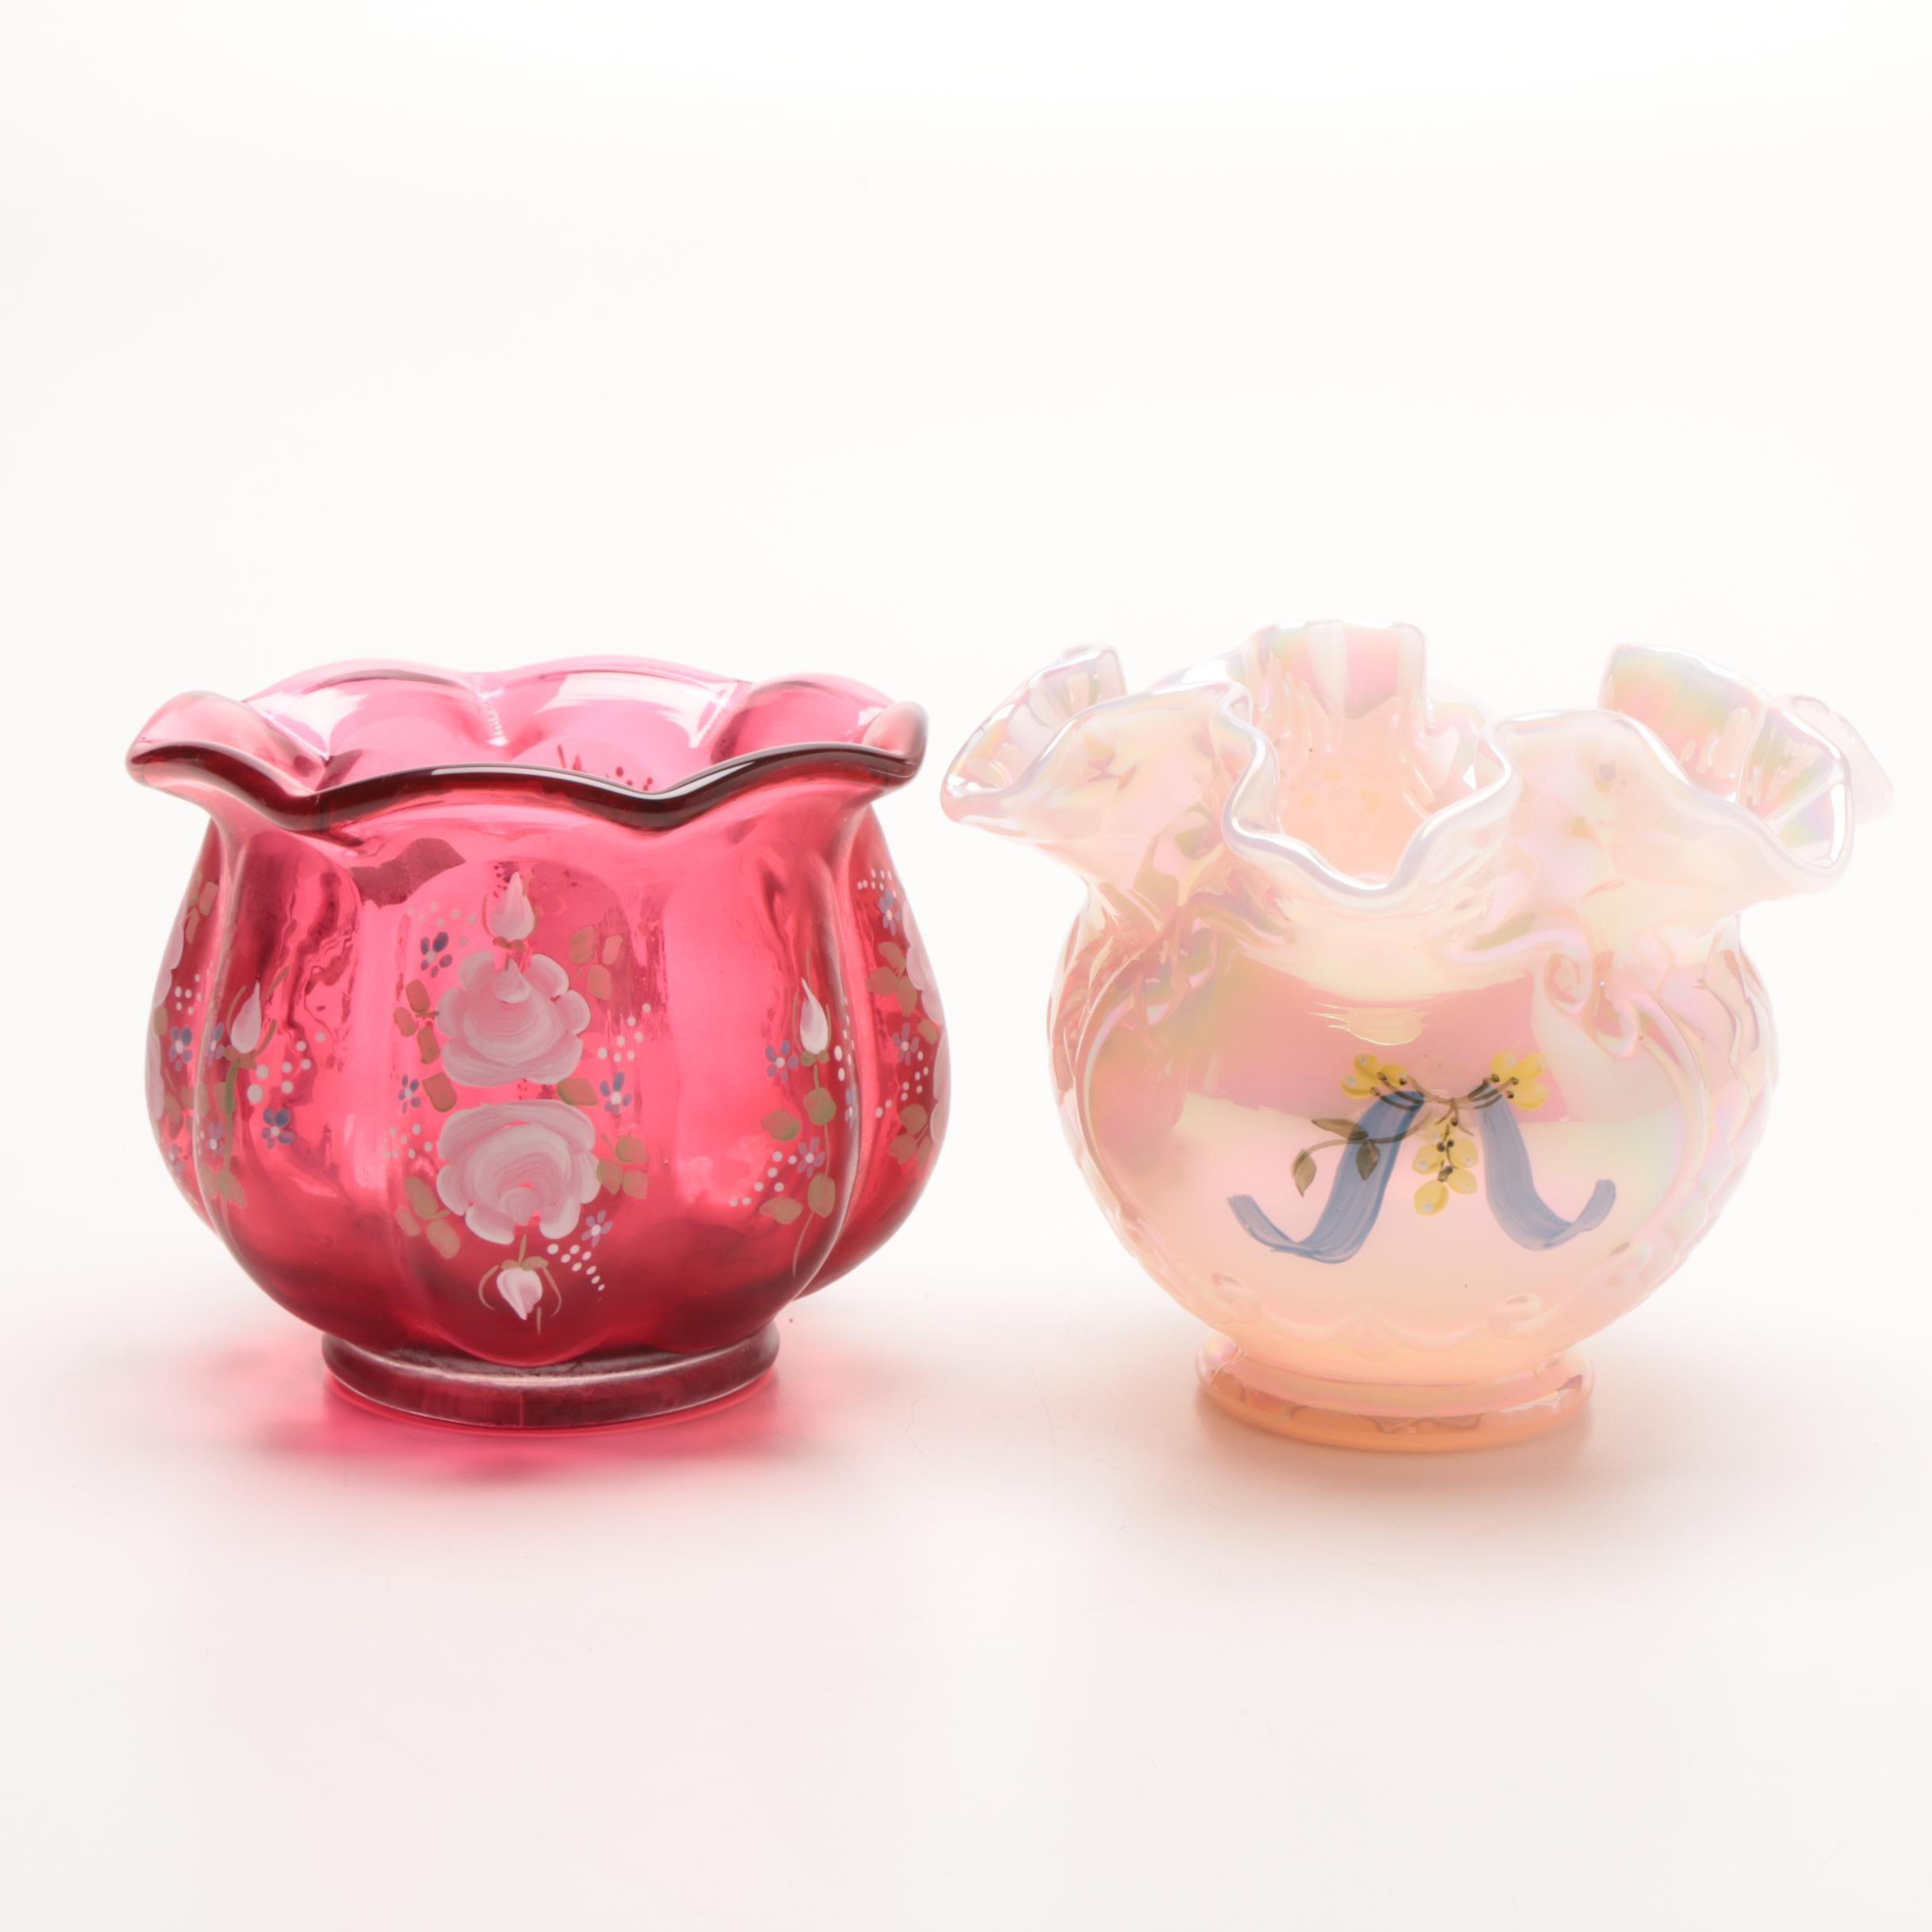 Singed Fenton Art Glass Ruffled Rim Vases